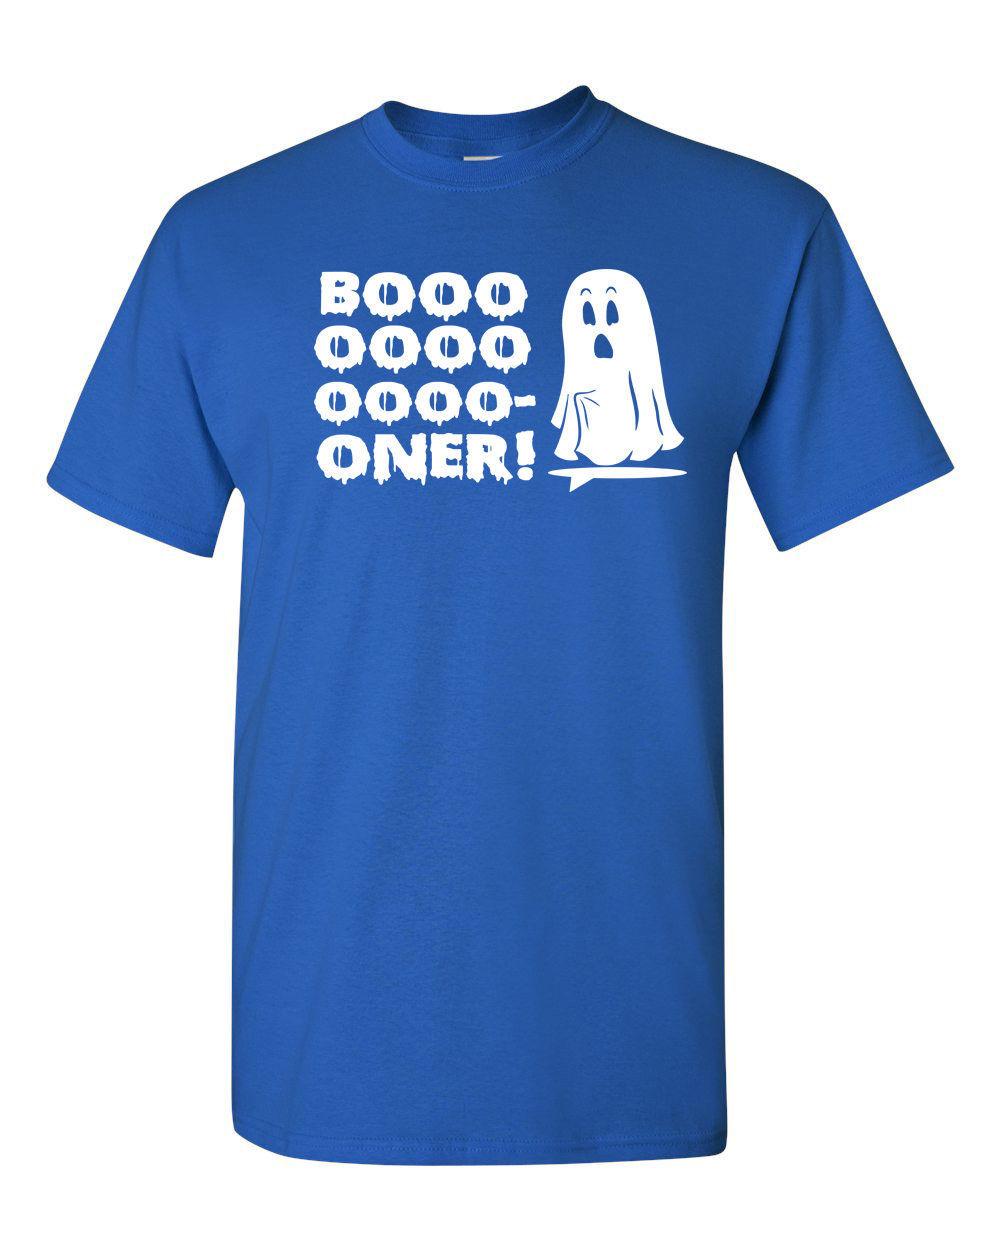 BOO BOOOOONER Boner Ghost Halloween Funny Men's Tee Shirt 1260